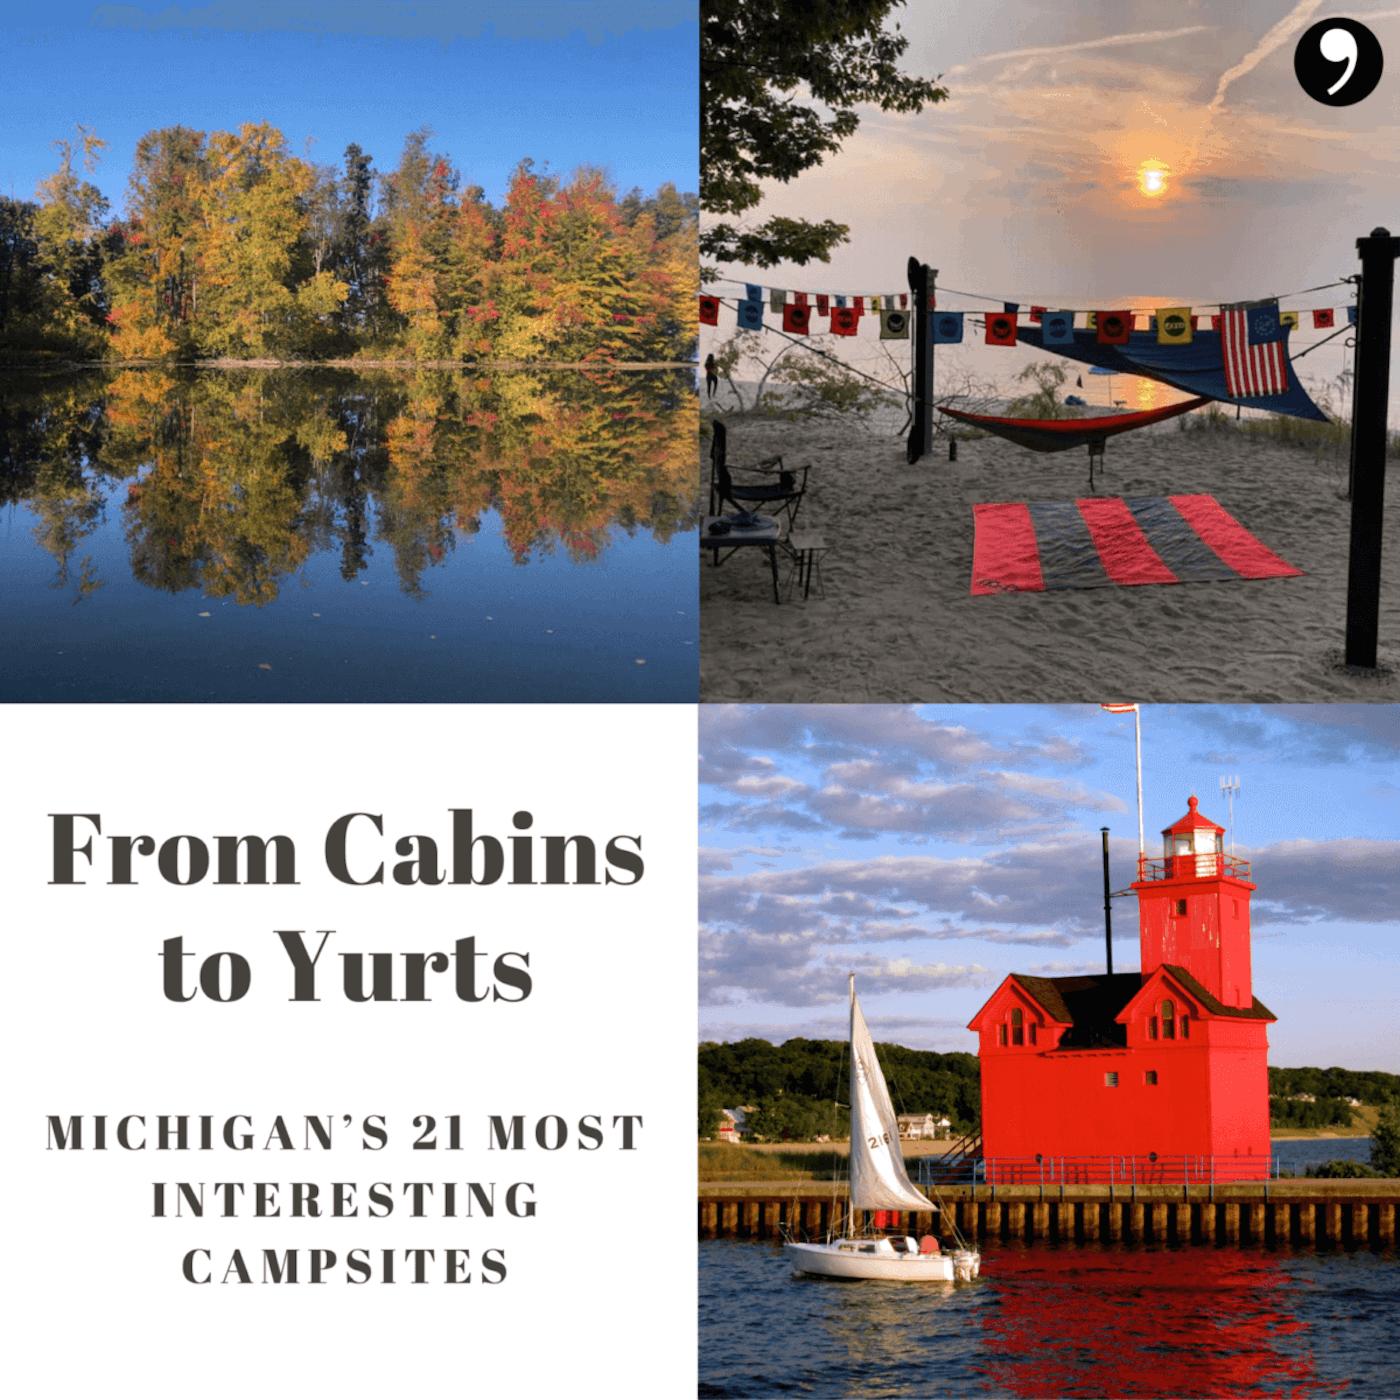 Michigan's 21 Most Interesting Campsites